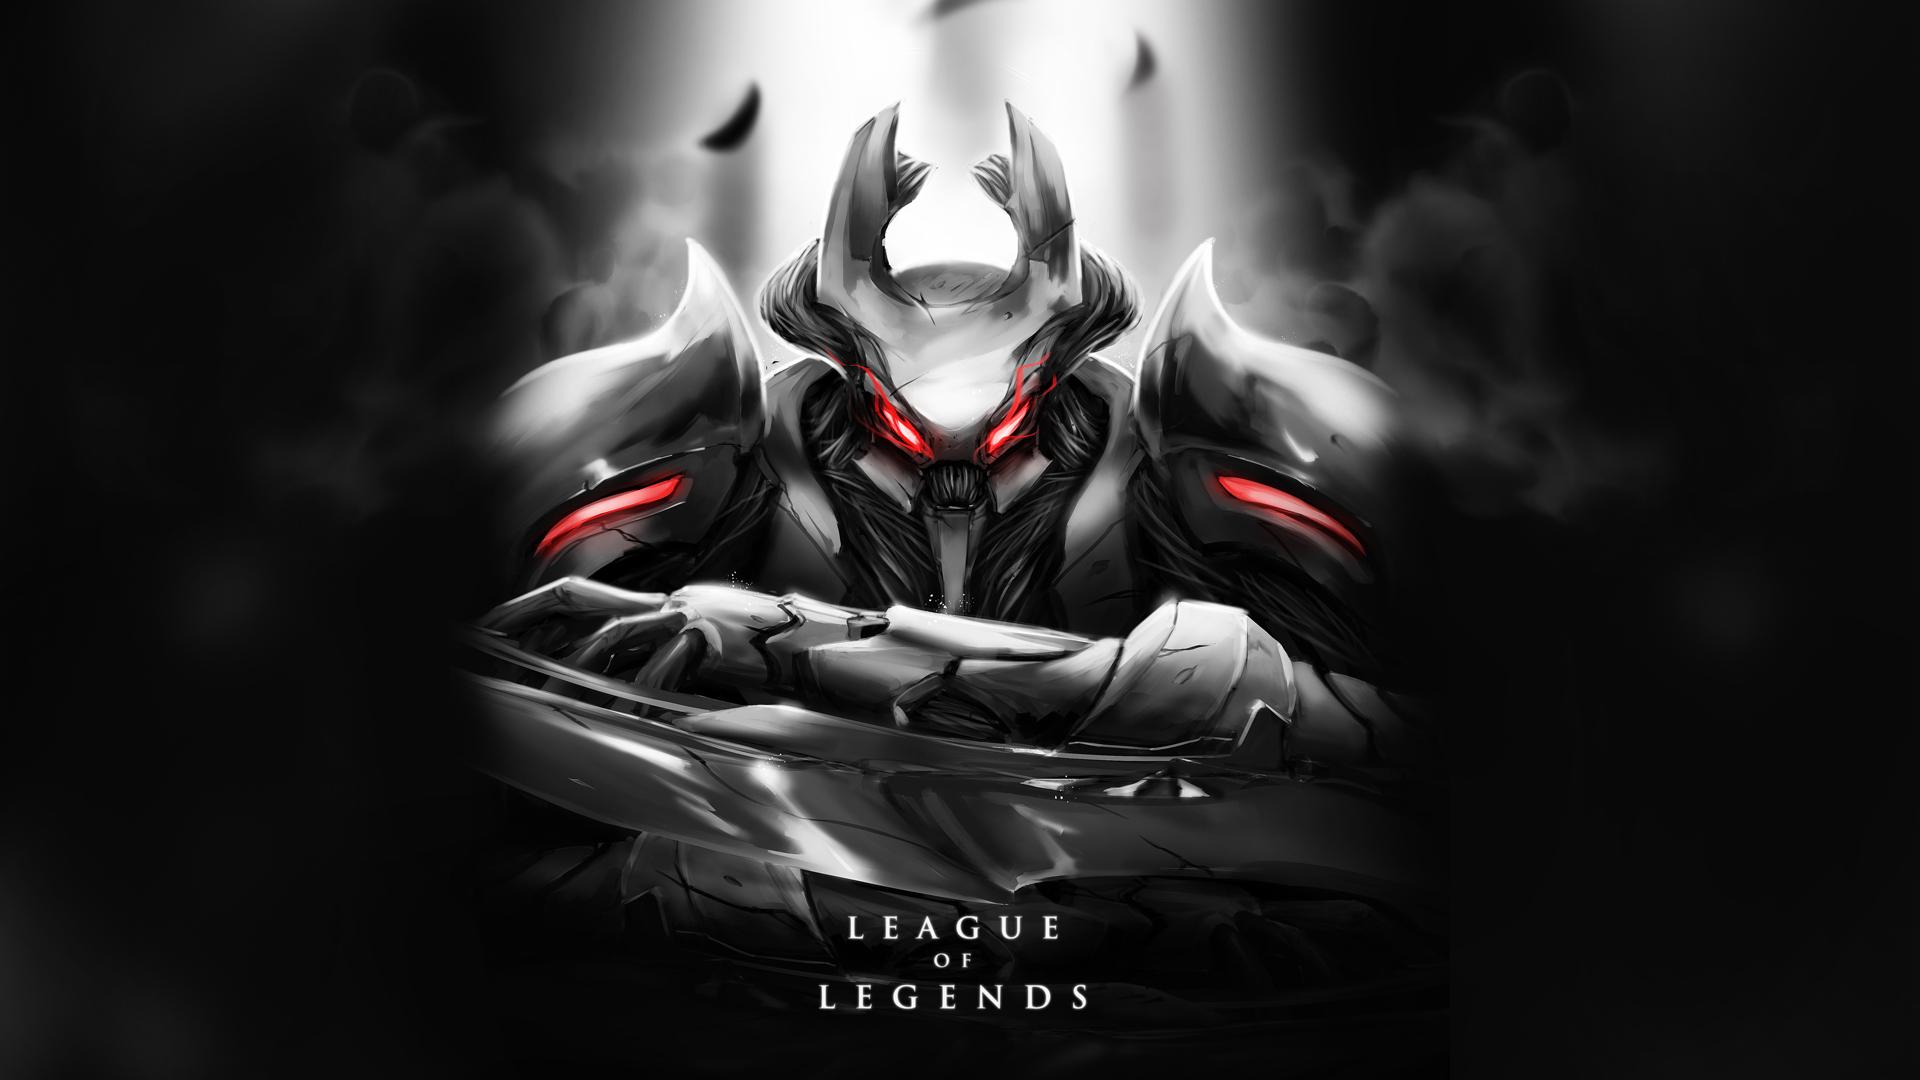 League of Legends wallpaper 92